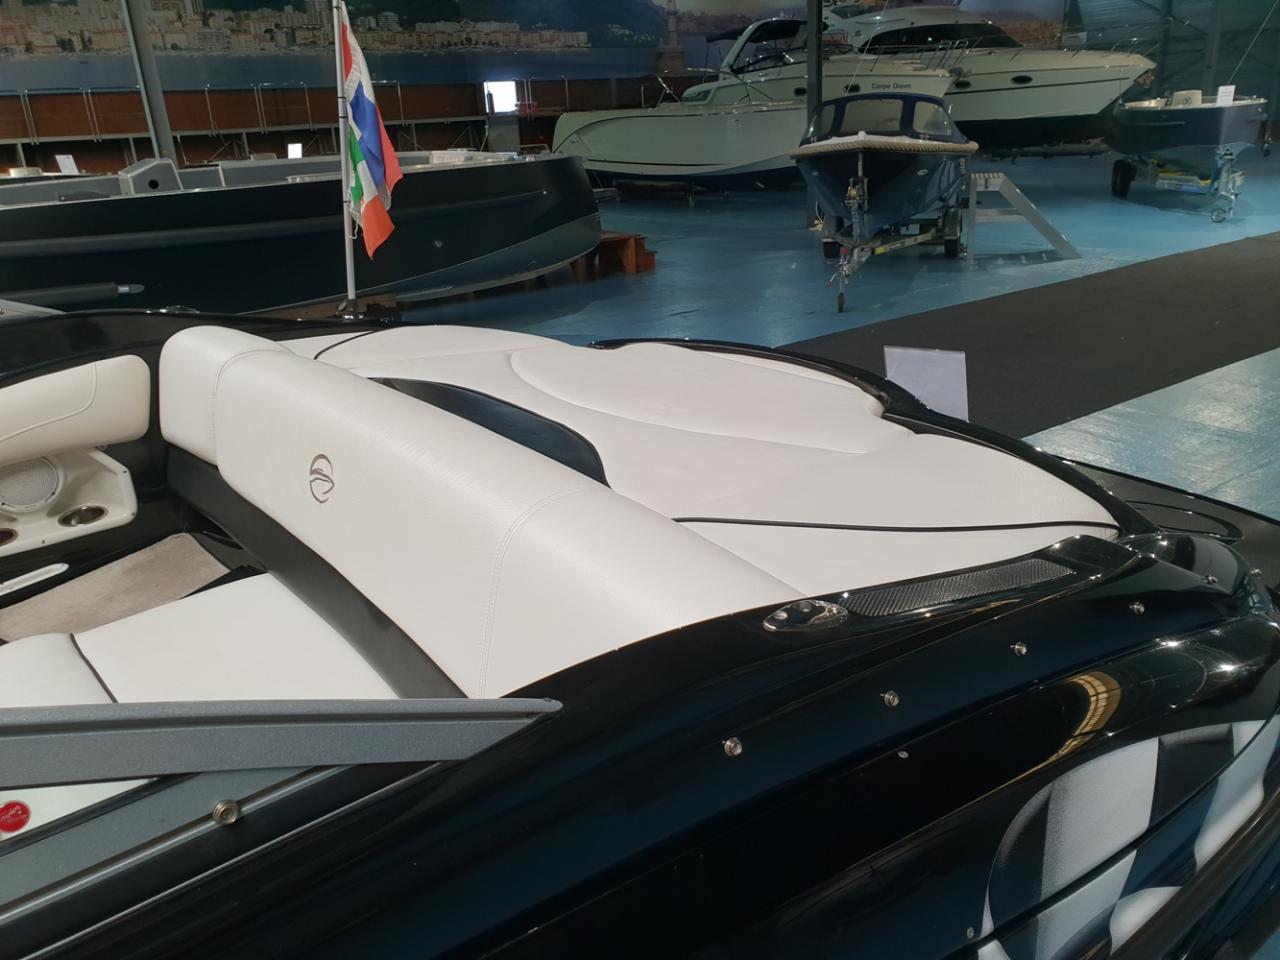 Crownline 220 met Mercruiser 5 liter V8 260 pk 9